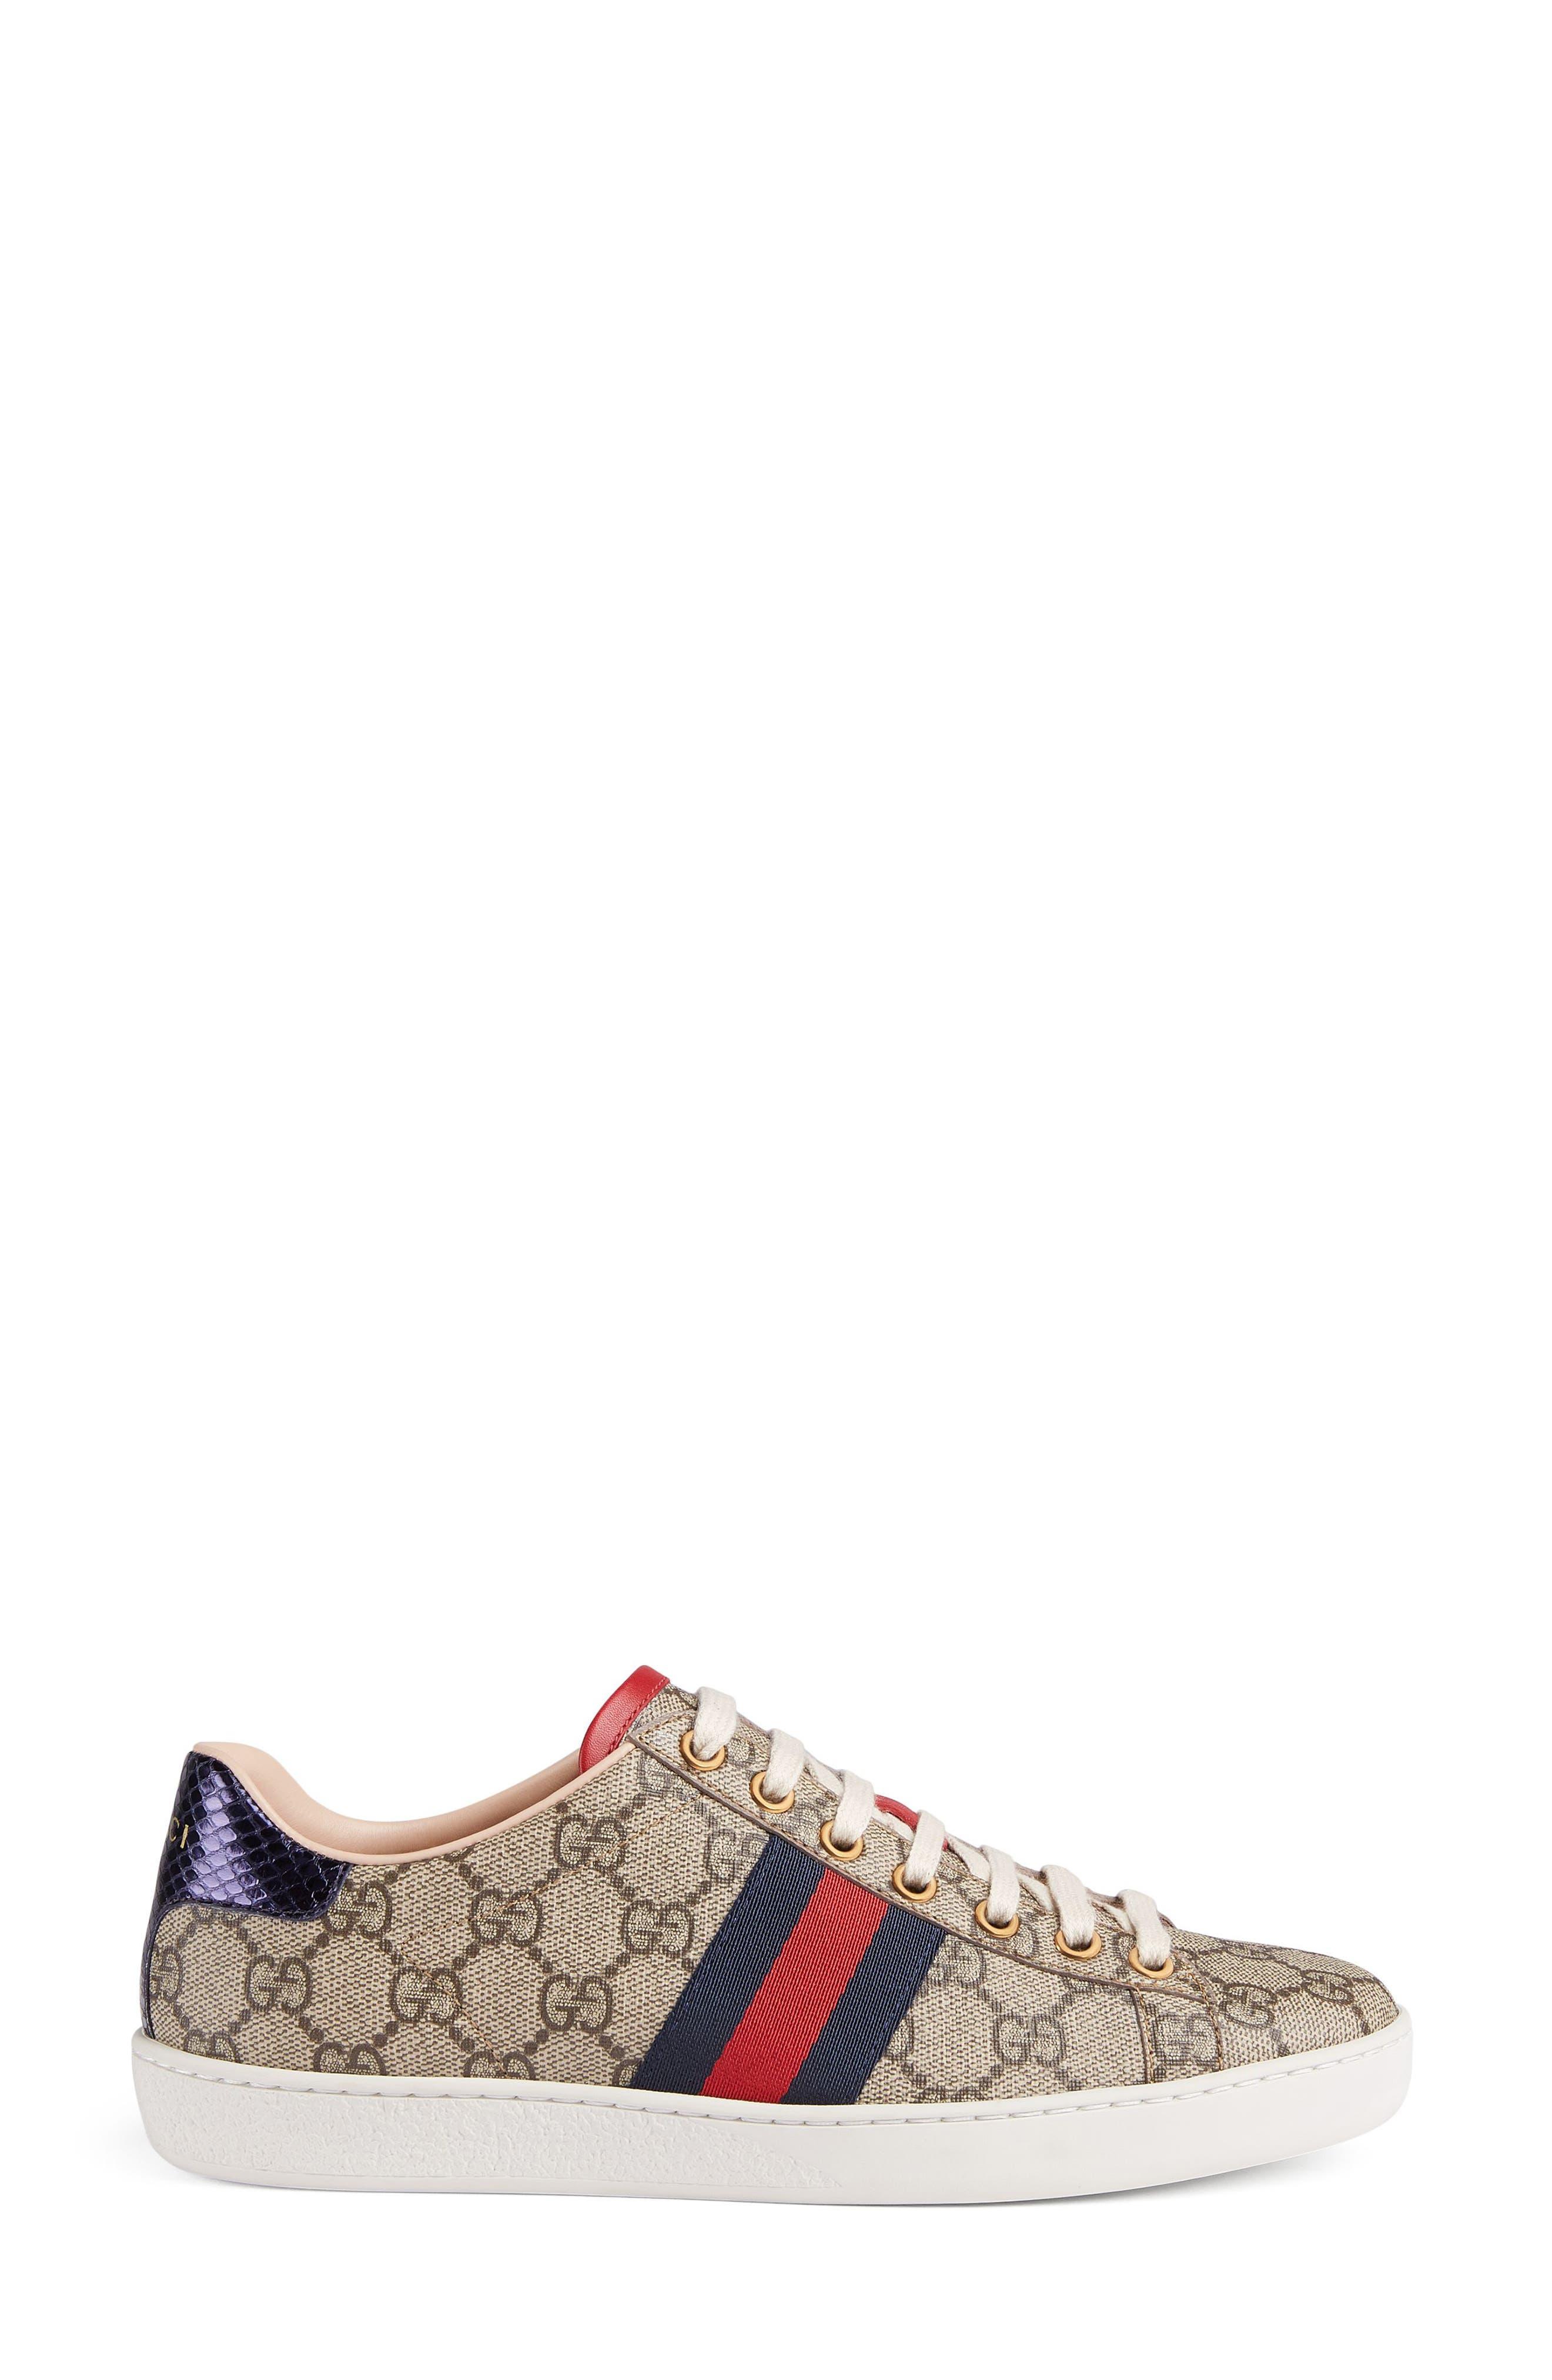 New Ace GG Supreme Sneaker,                             Alternate thumbnail 2, color,                             BEIGE